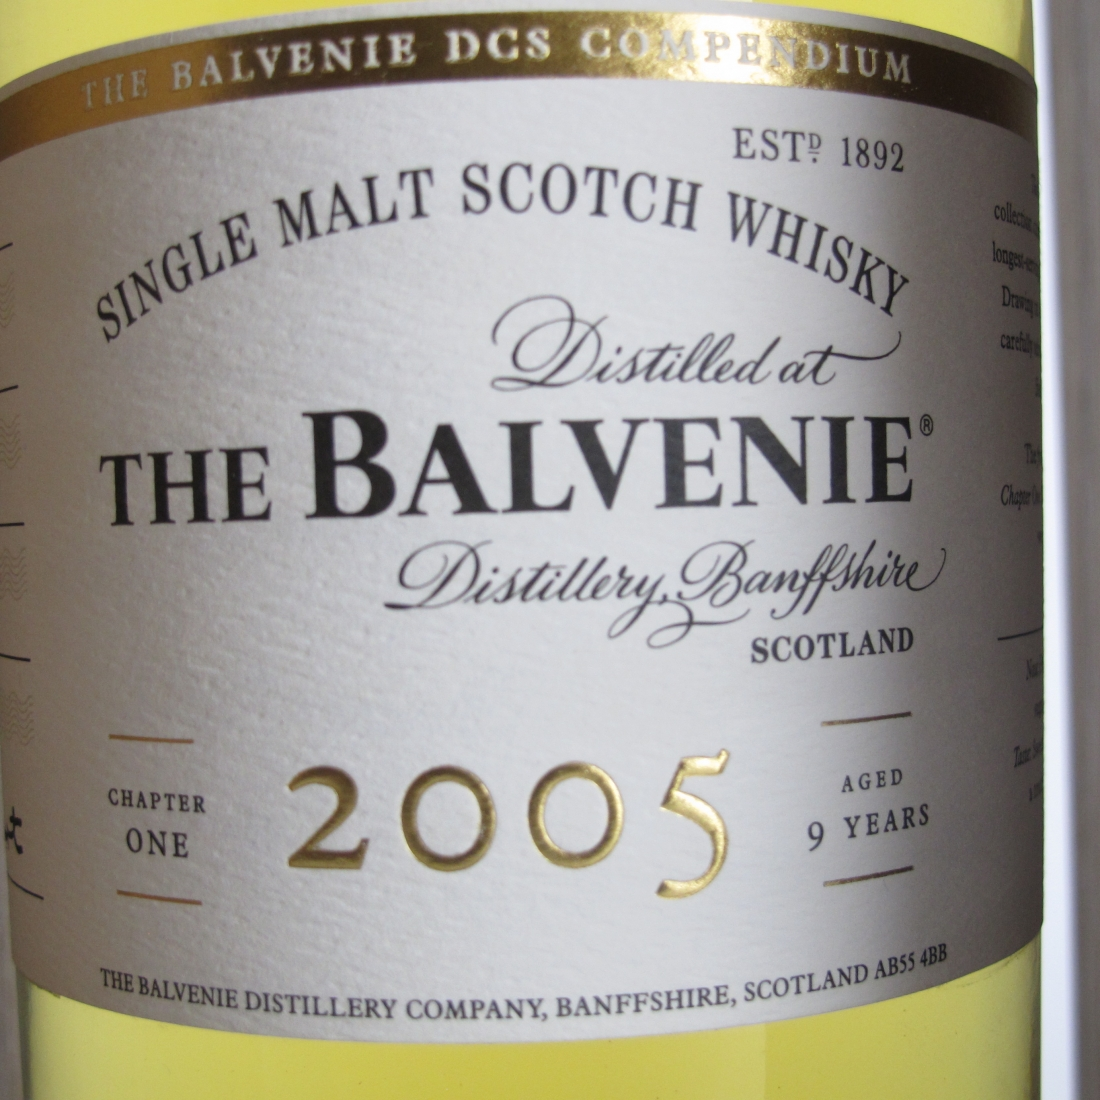 Balvenie 2005 DCS Compendium 9 Years Old Chapter #1